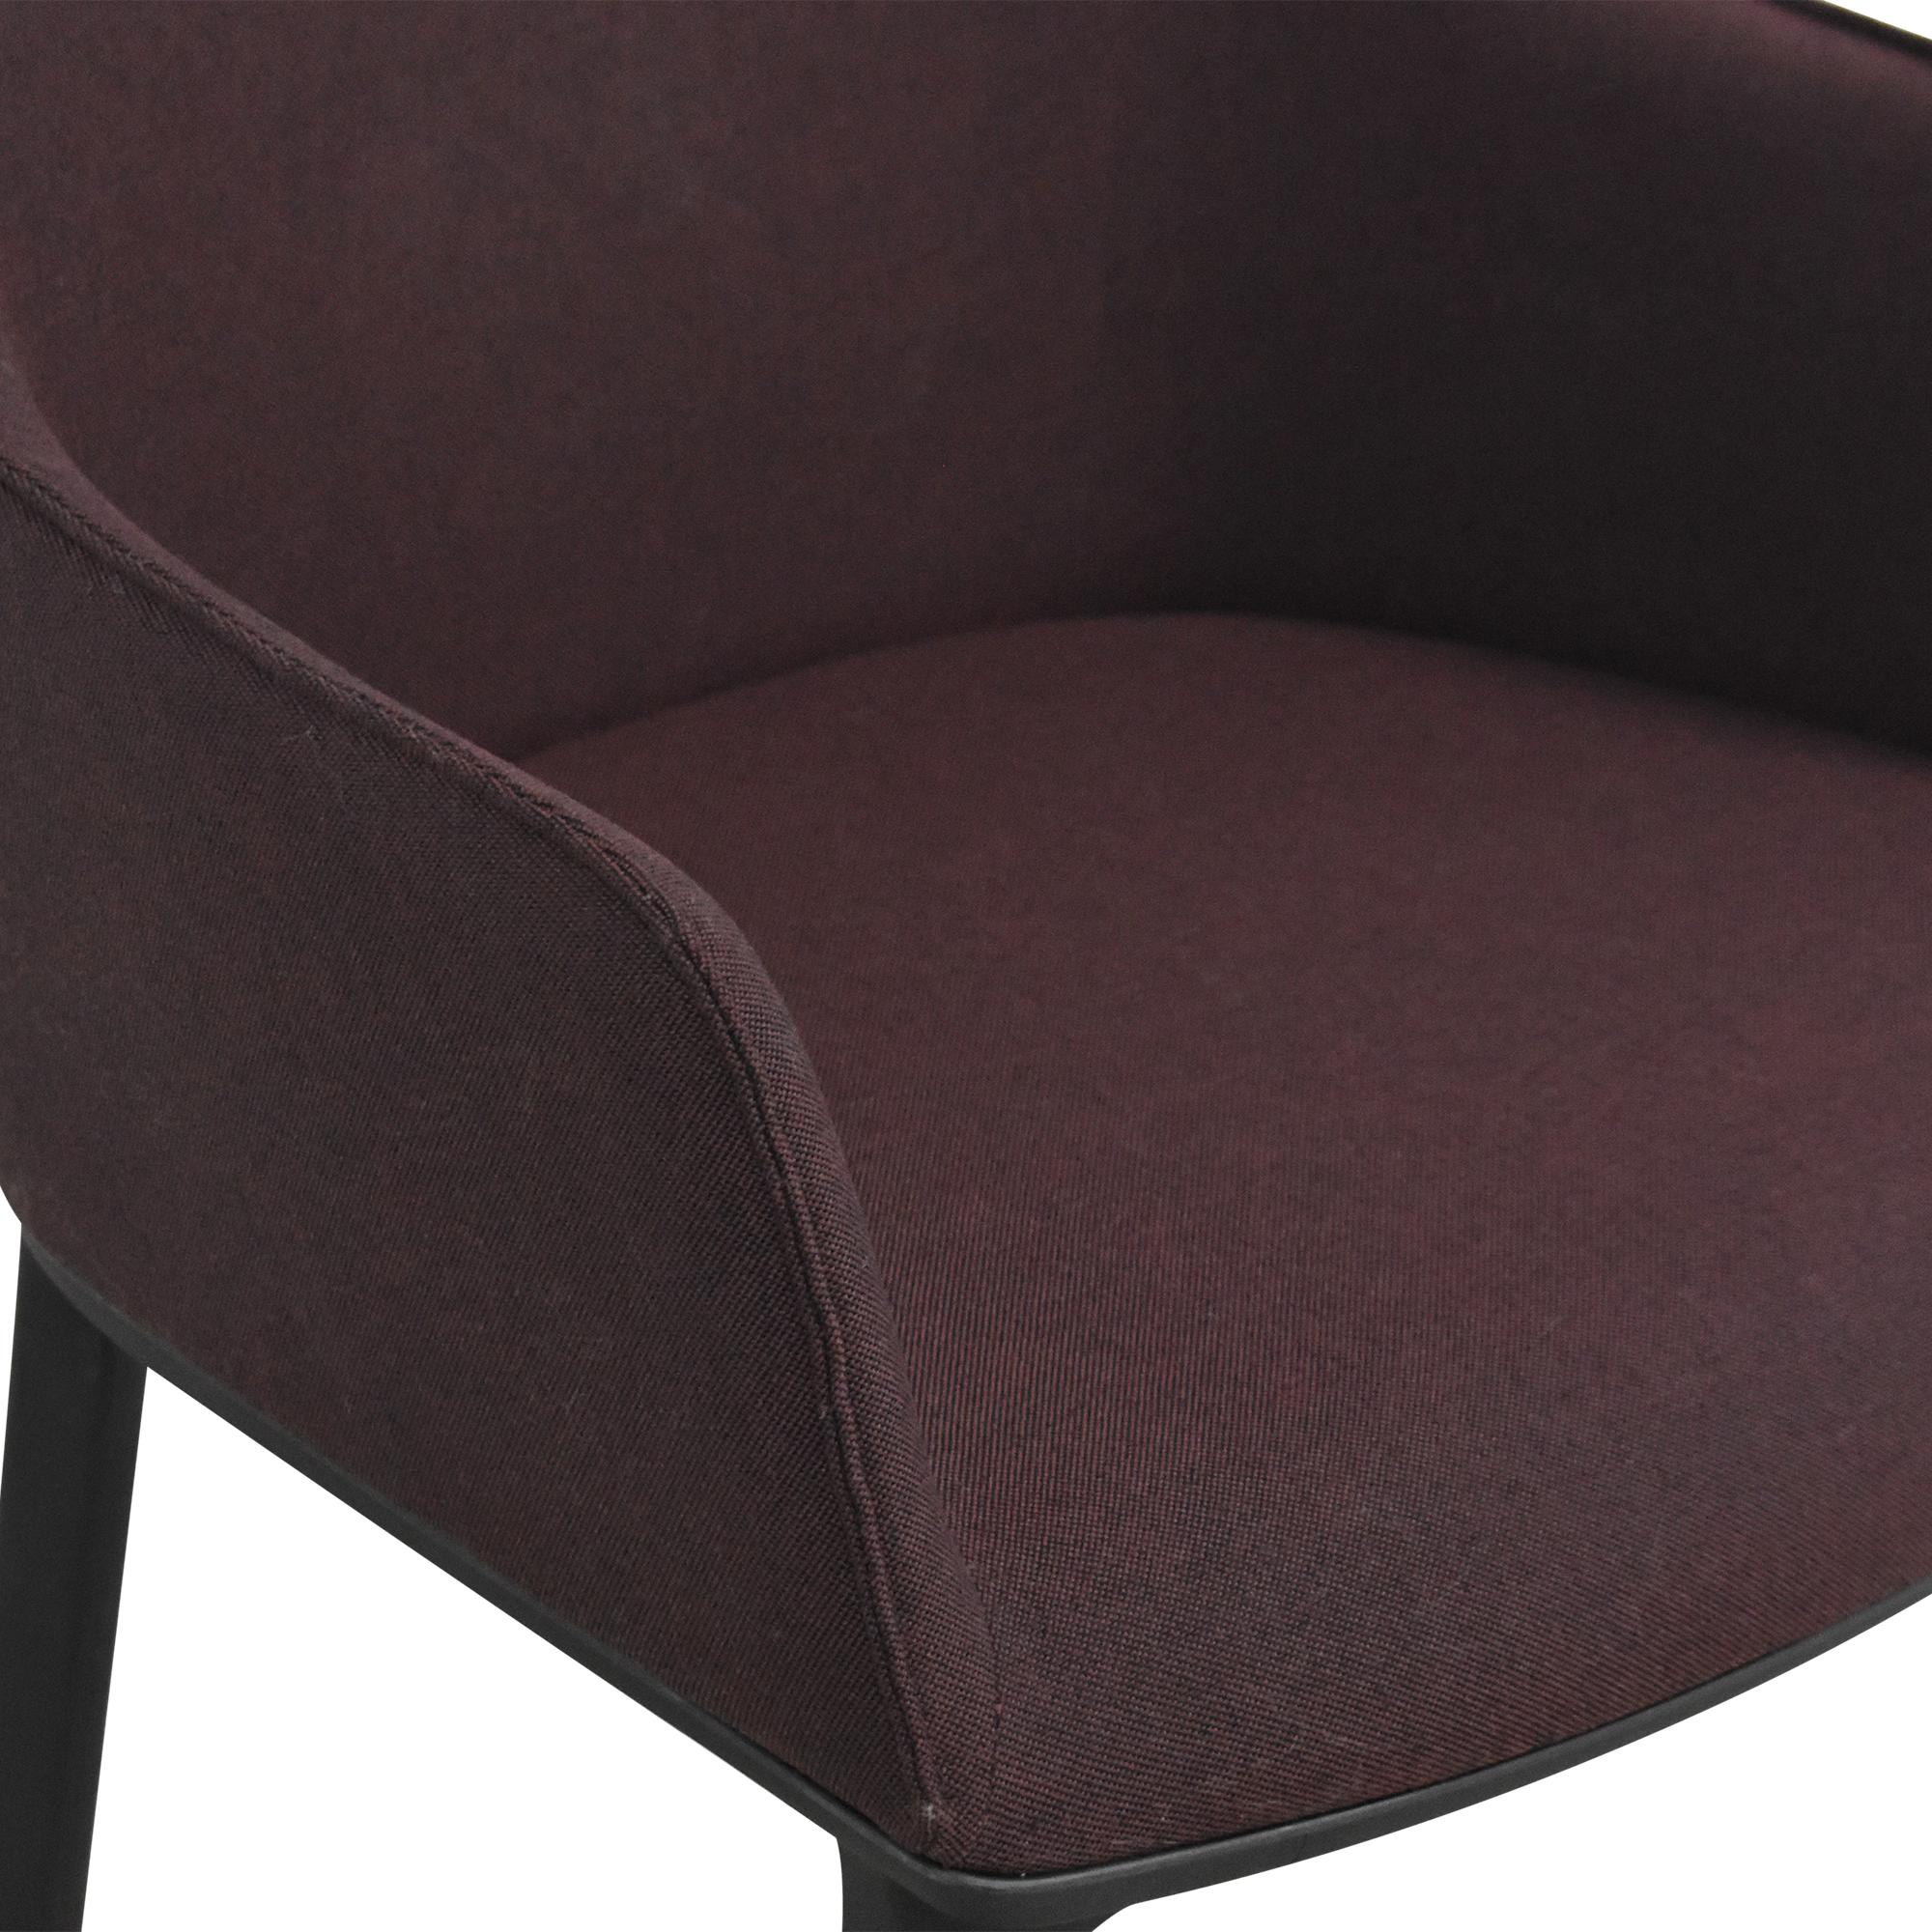 buy Vitra Softshell Arm Chair Vitra Chairs